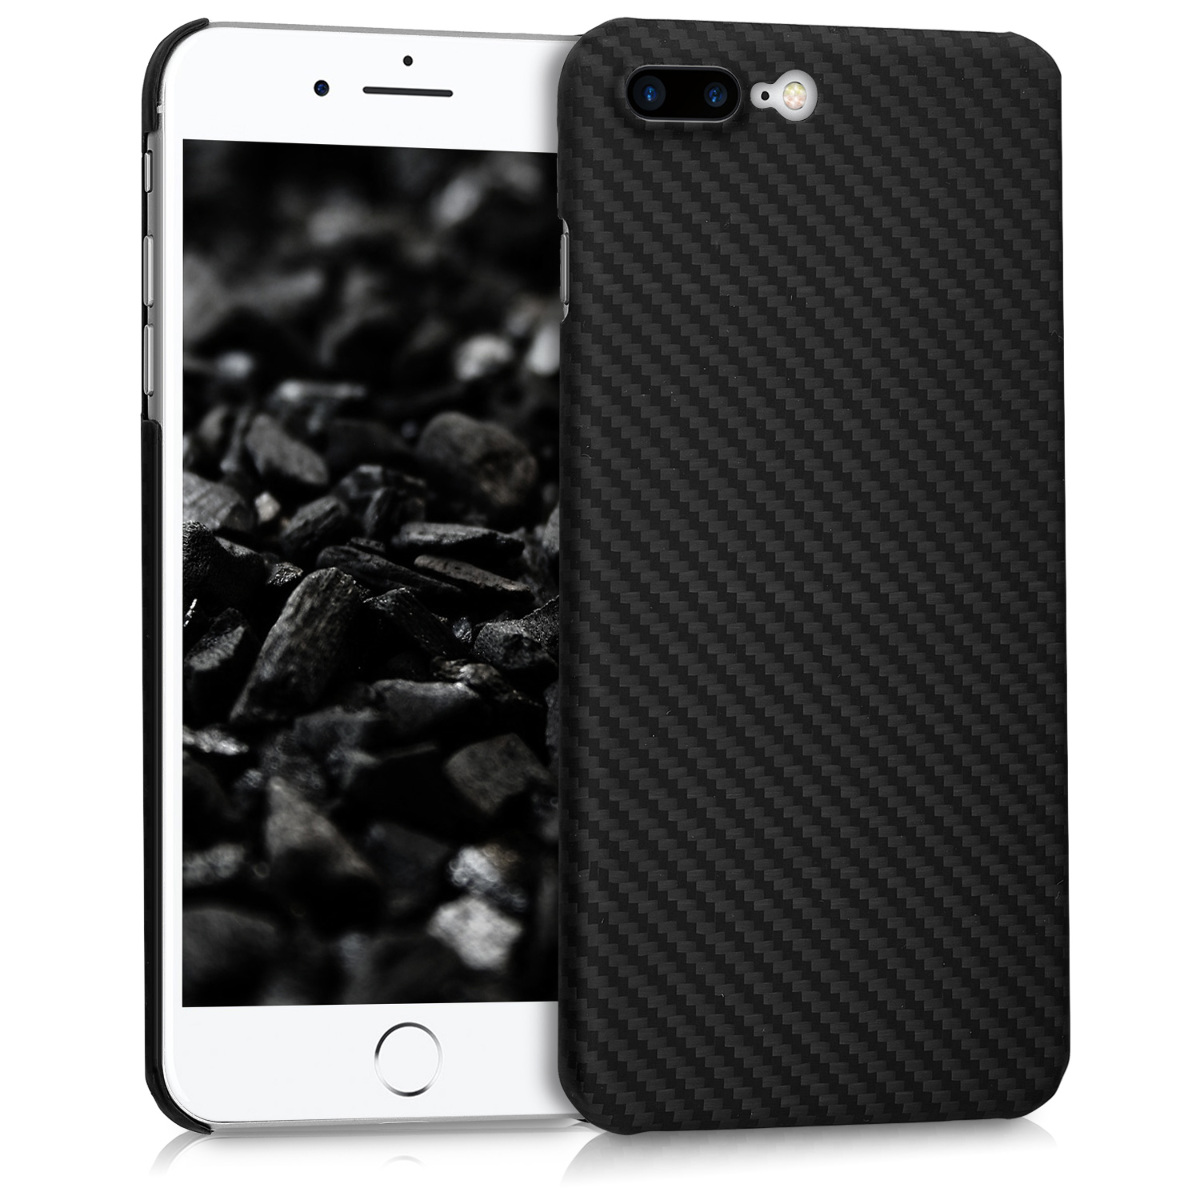 Kalibri Aramid Fiber Body - Σκληρή Θήκη iPhone 8 Plus / iPhone 7 Plus - Black Matte (43684.01)